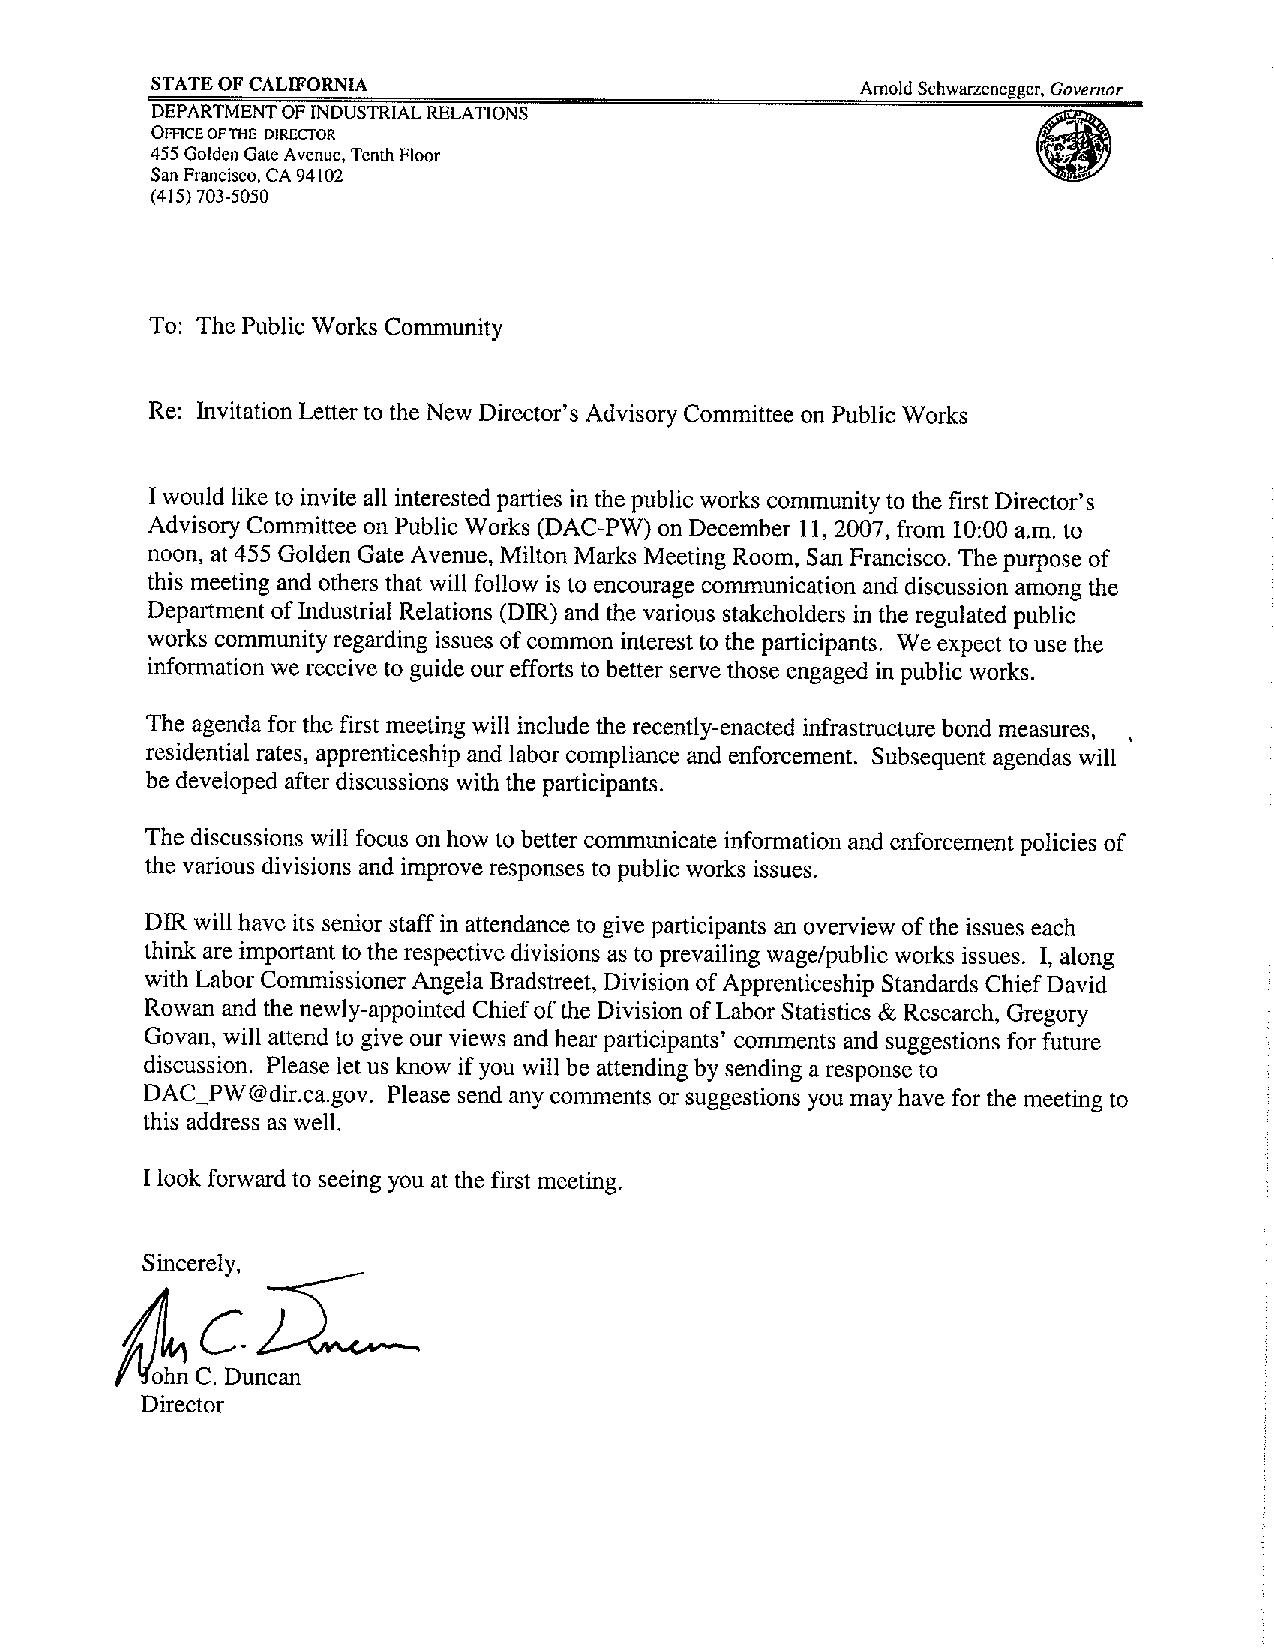 Advisory Committee Invitation Letter